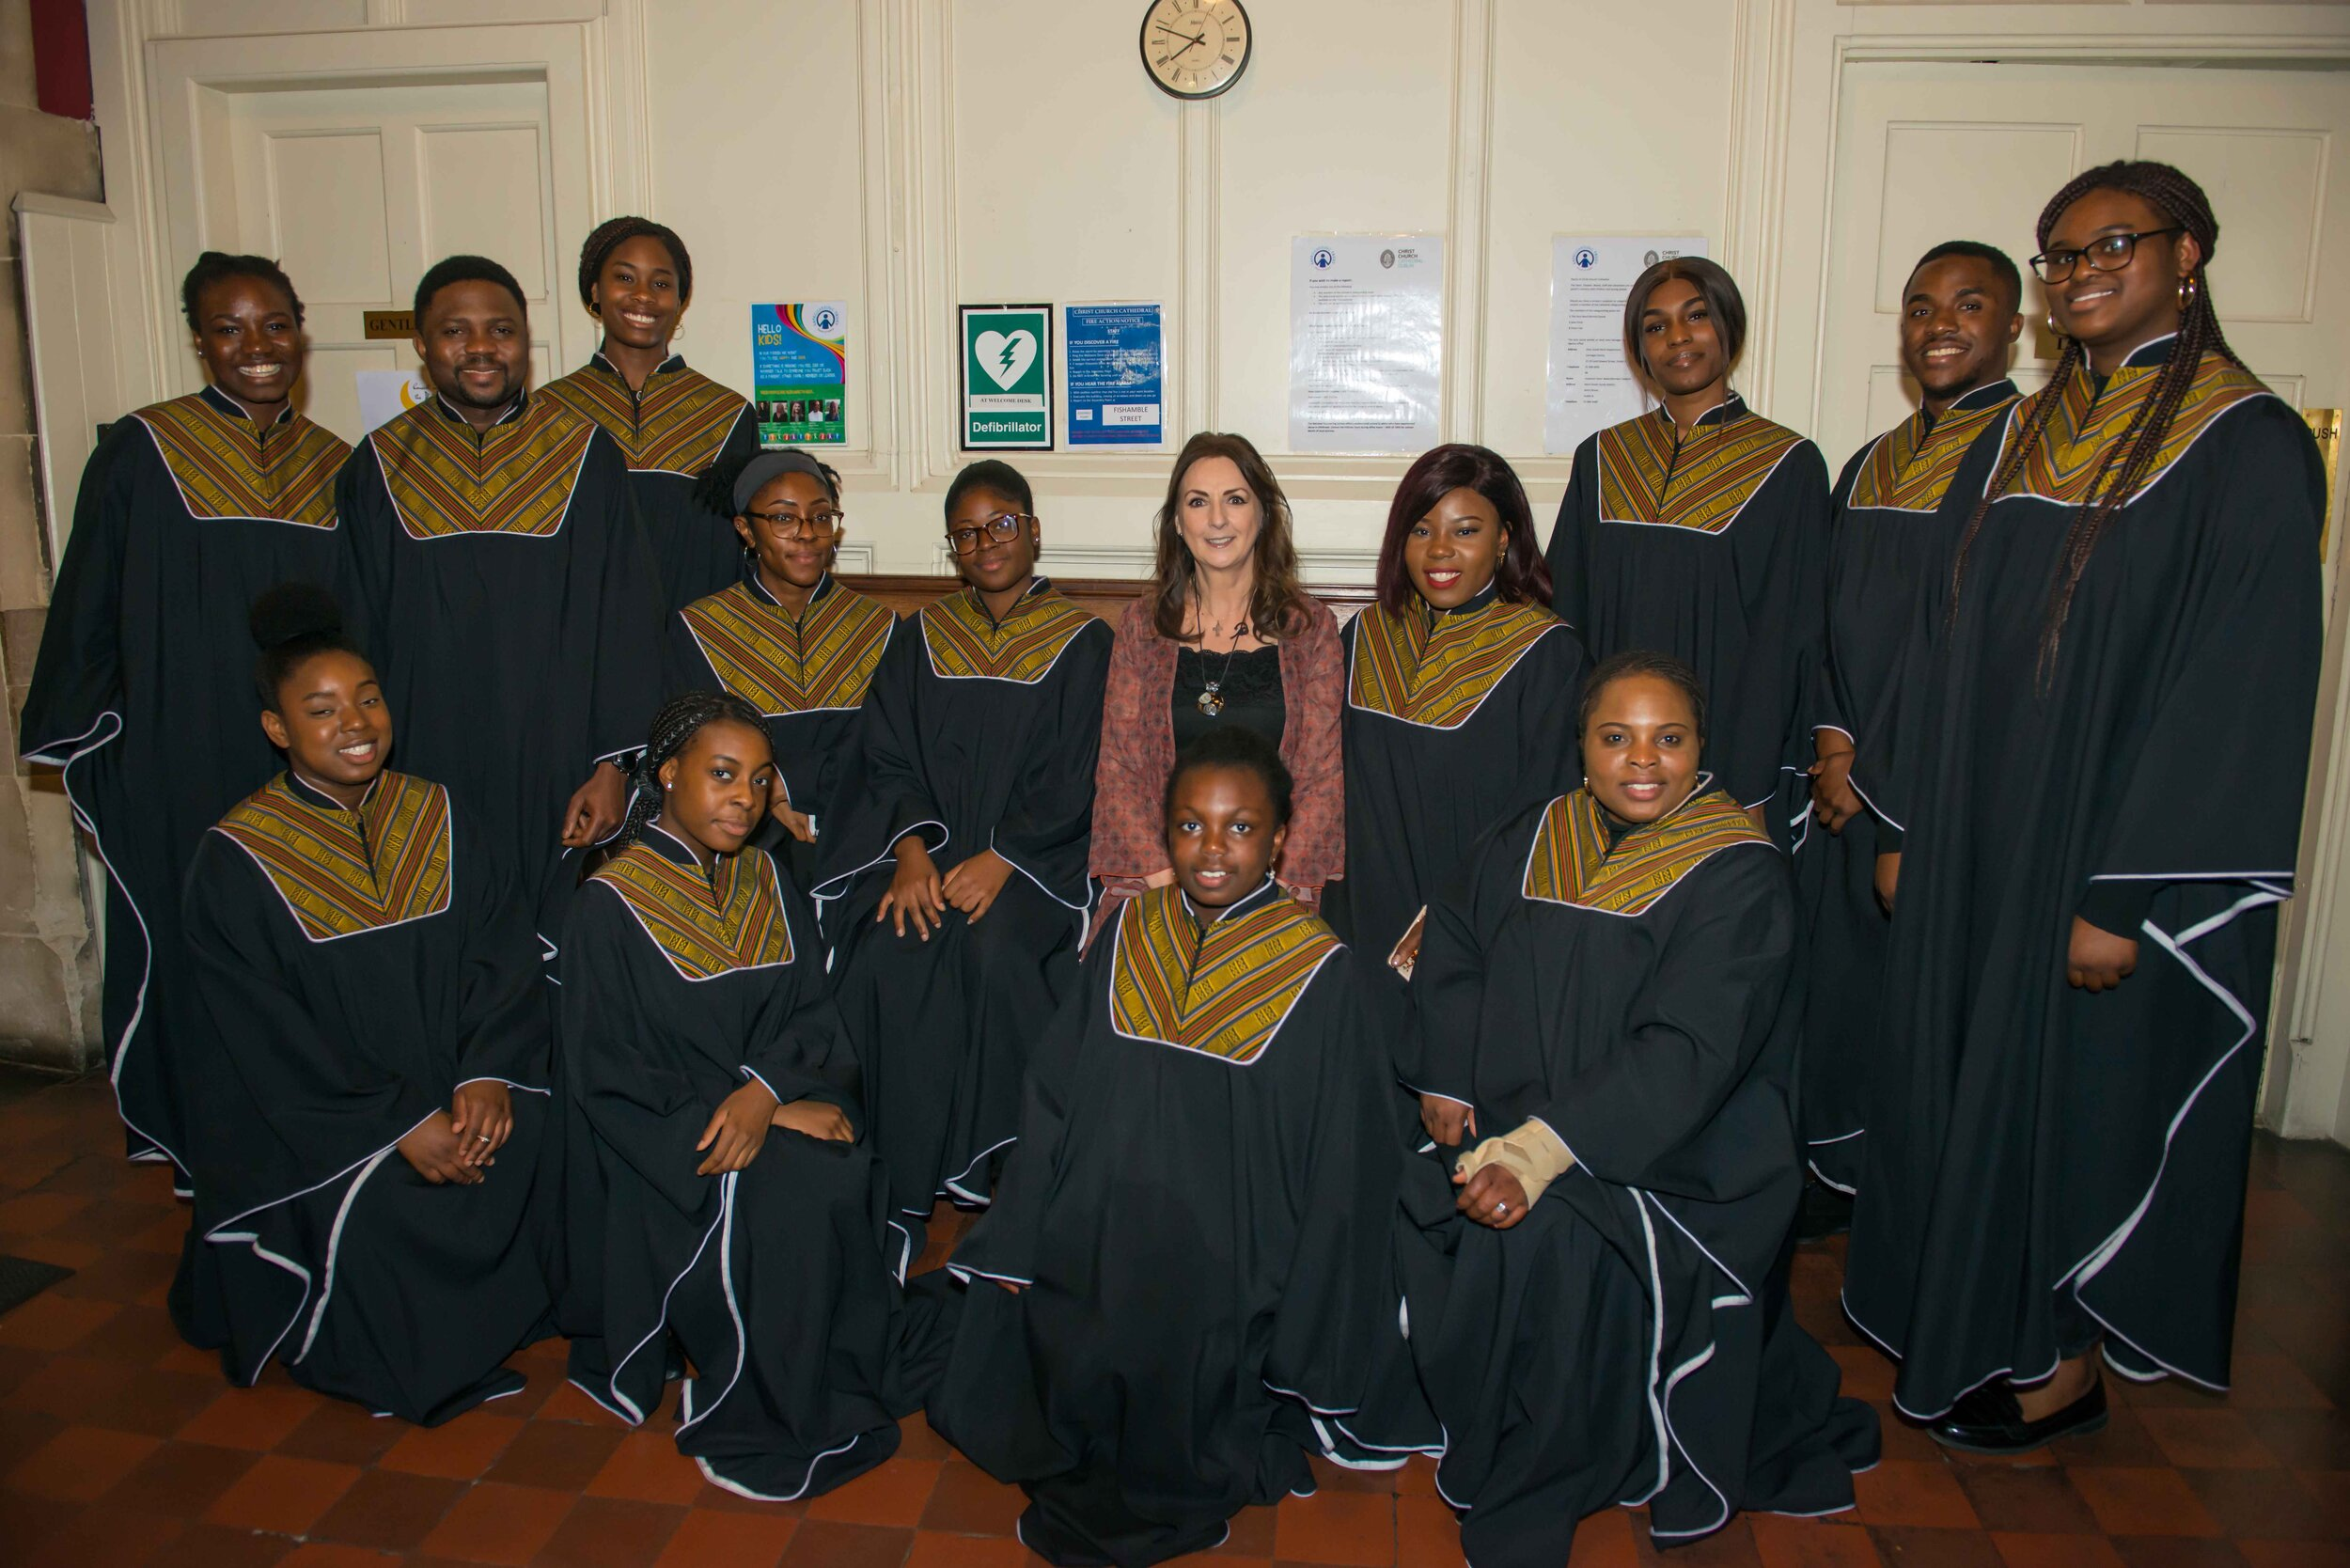 Concert in the Dark_African Gospel Choir Dublin and Moya Brennan.jpg